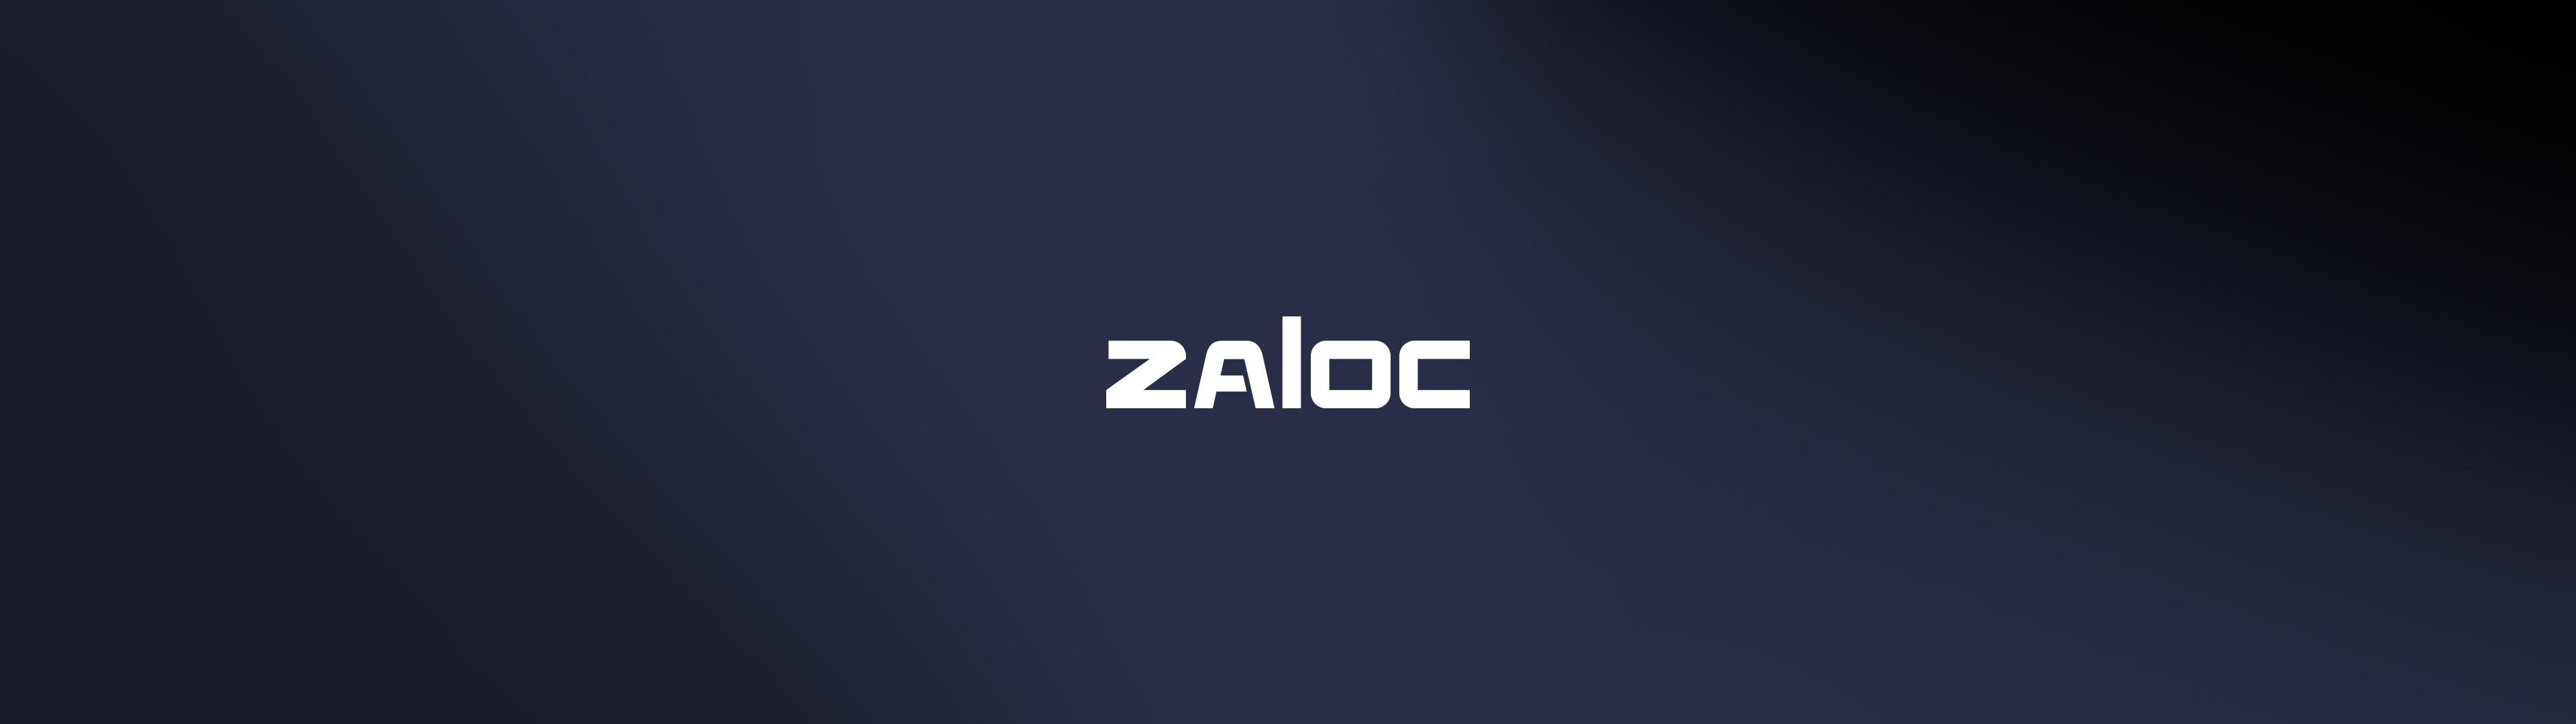 ZALOC ZM200 场景图